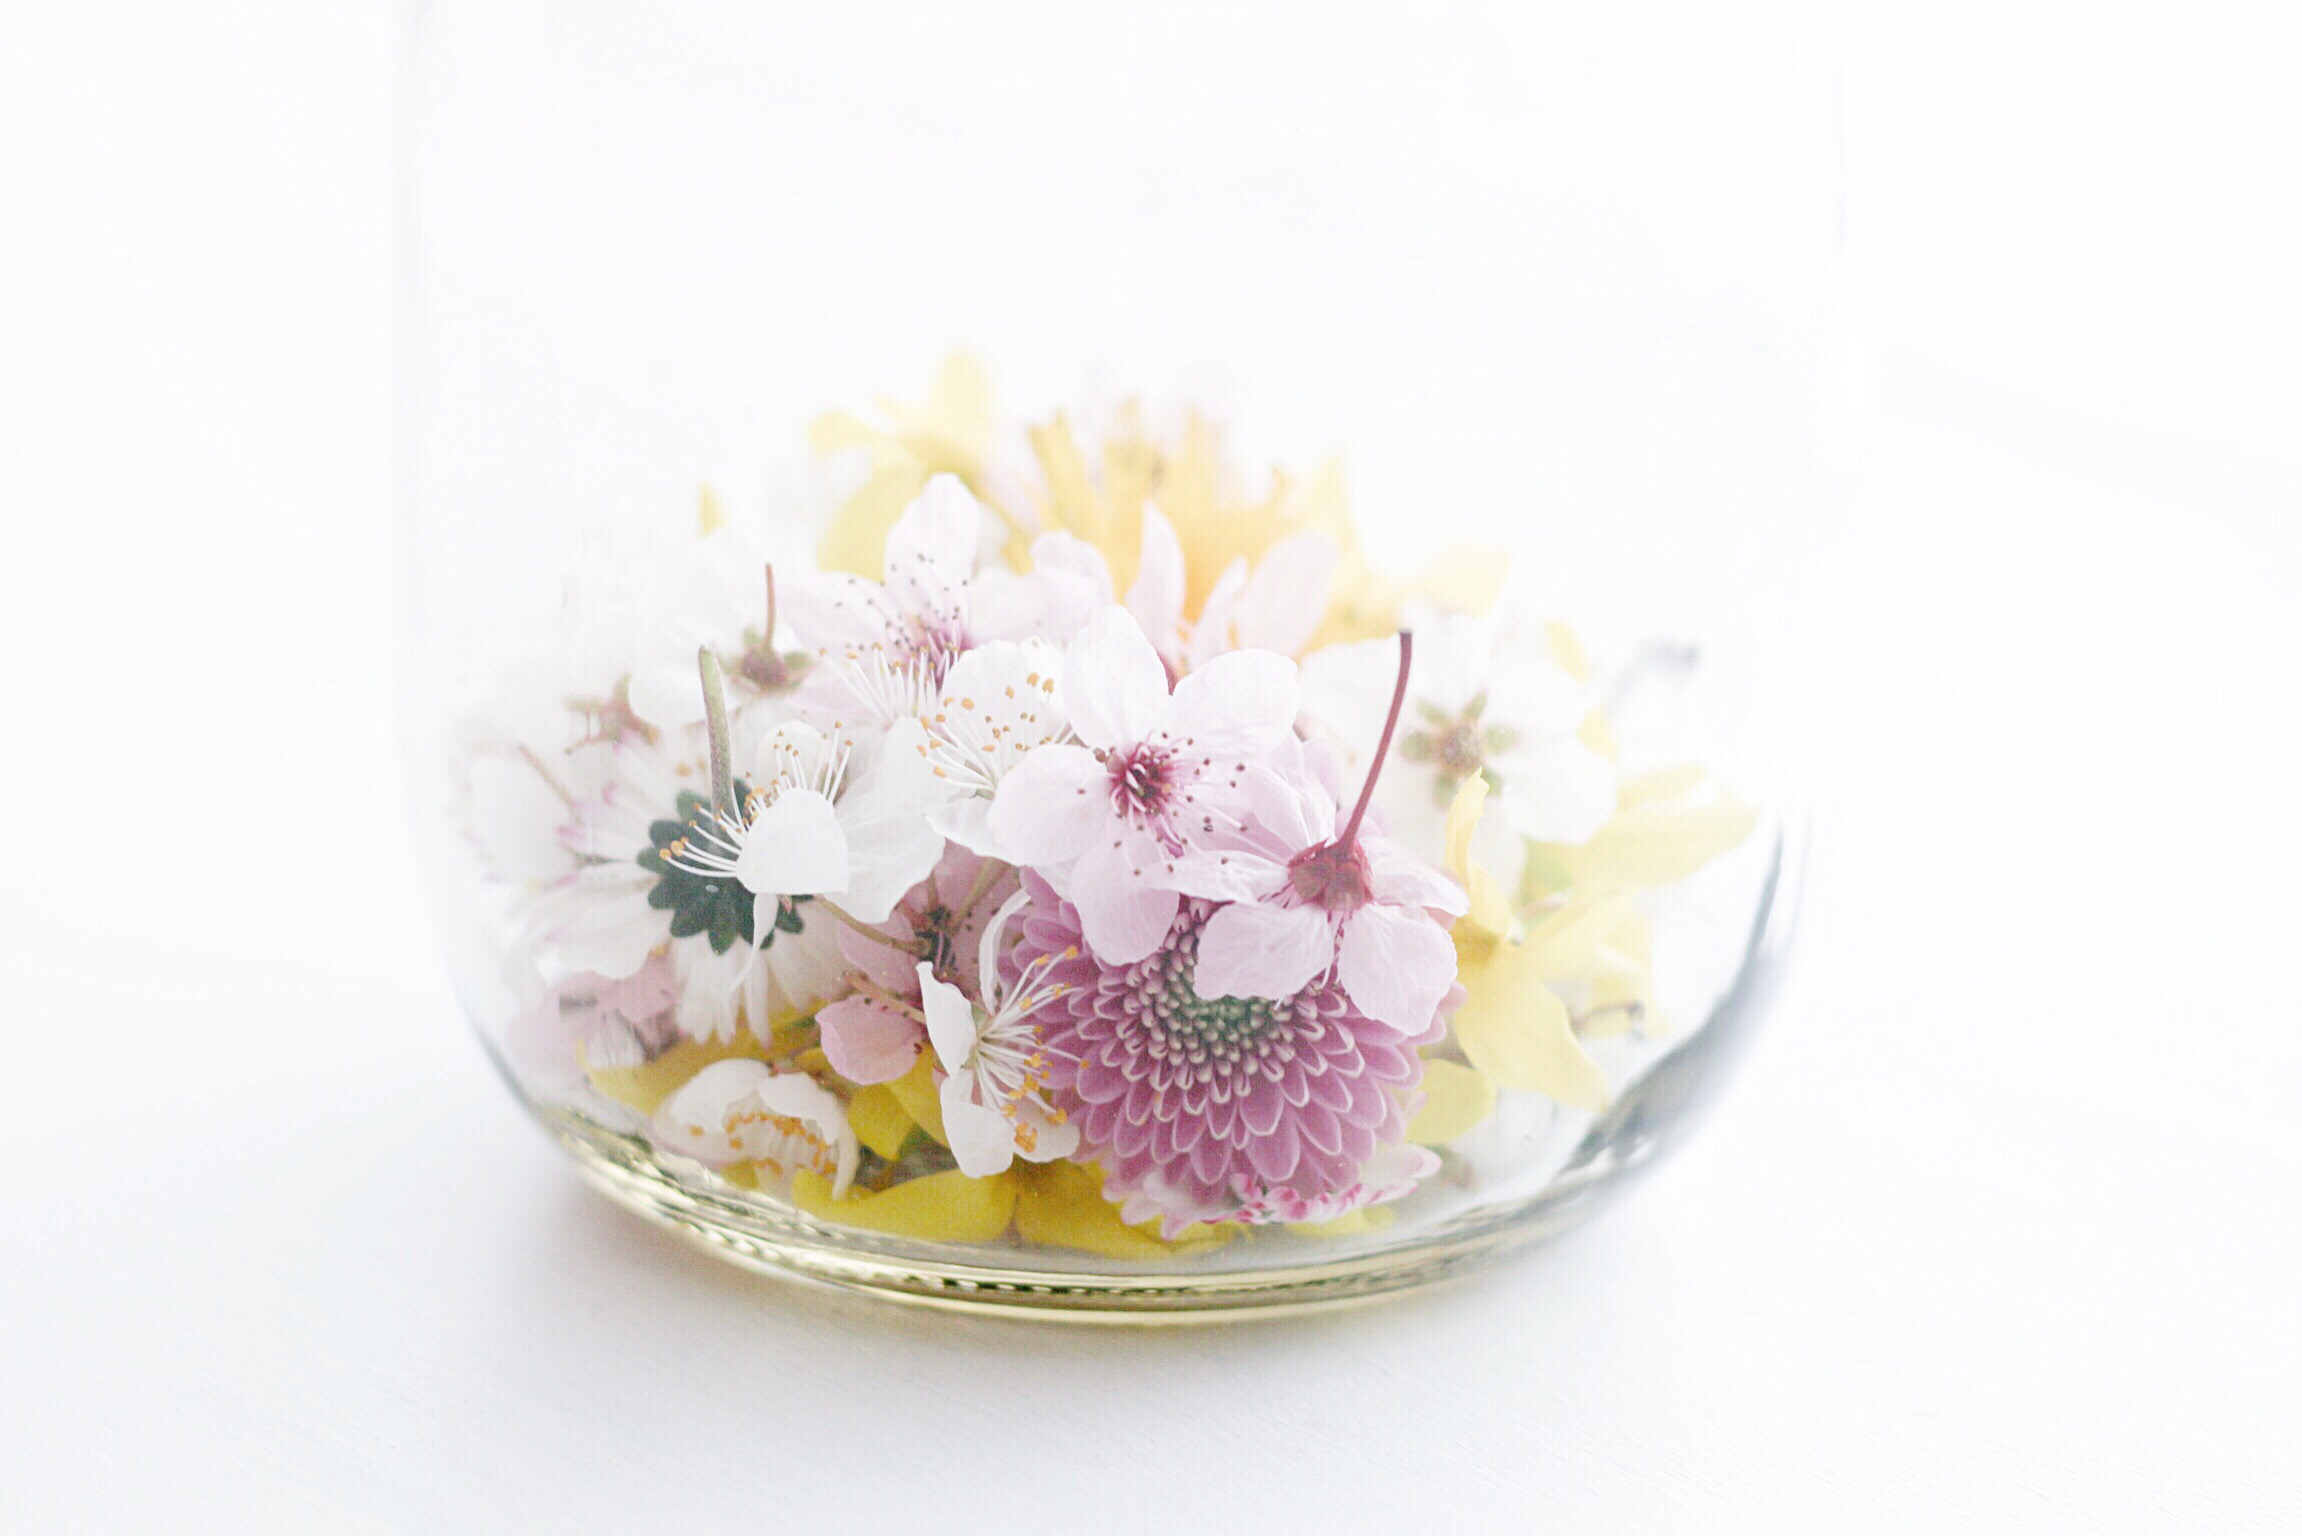 Trysha Gaba - Mon bocal à bonheur (gratitude jar) 2